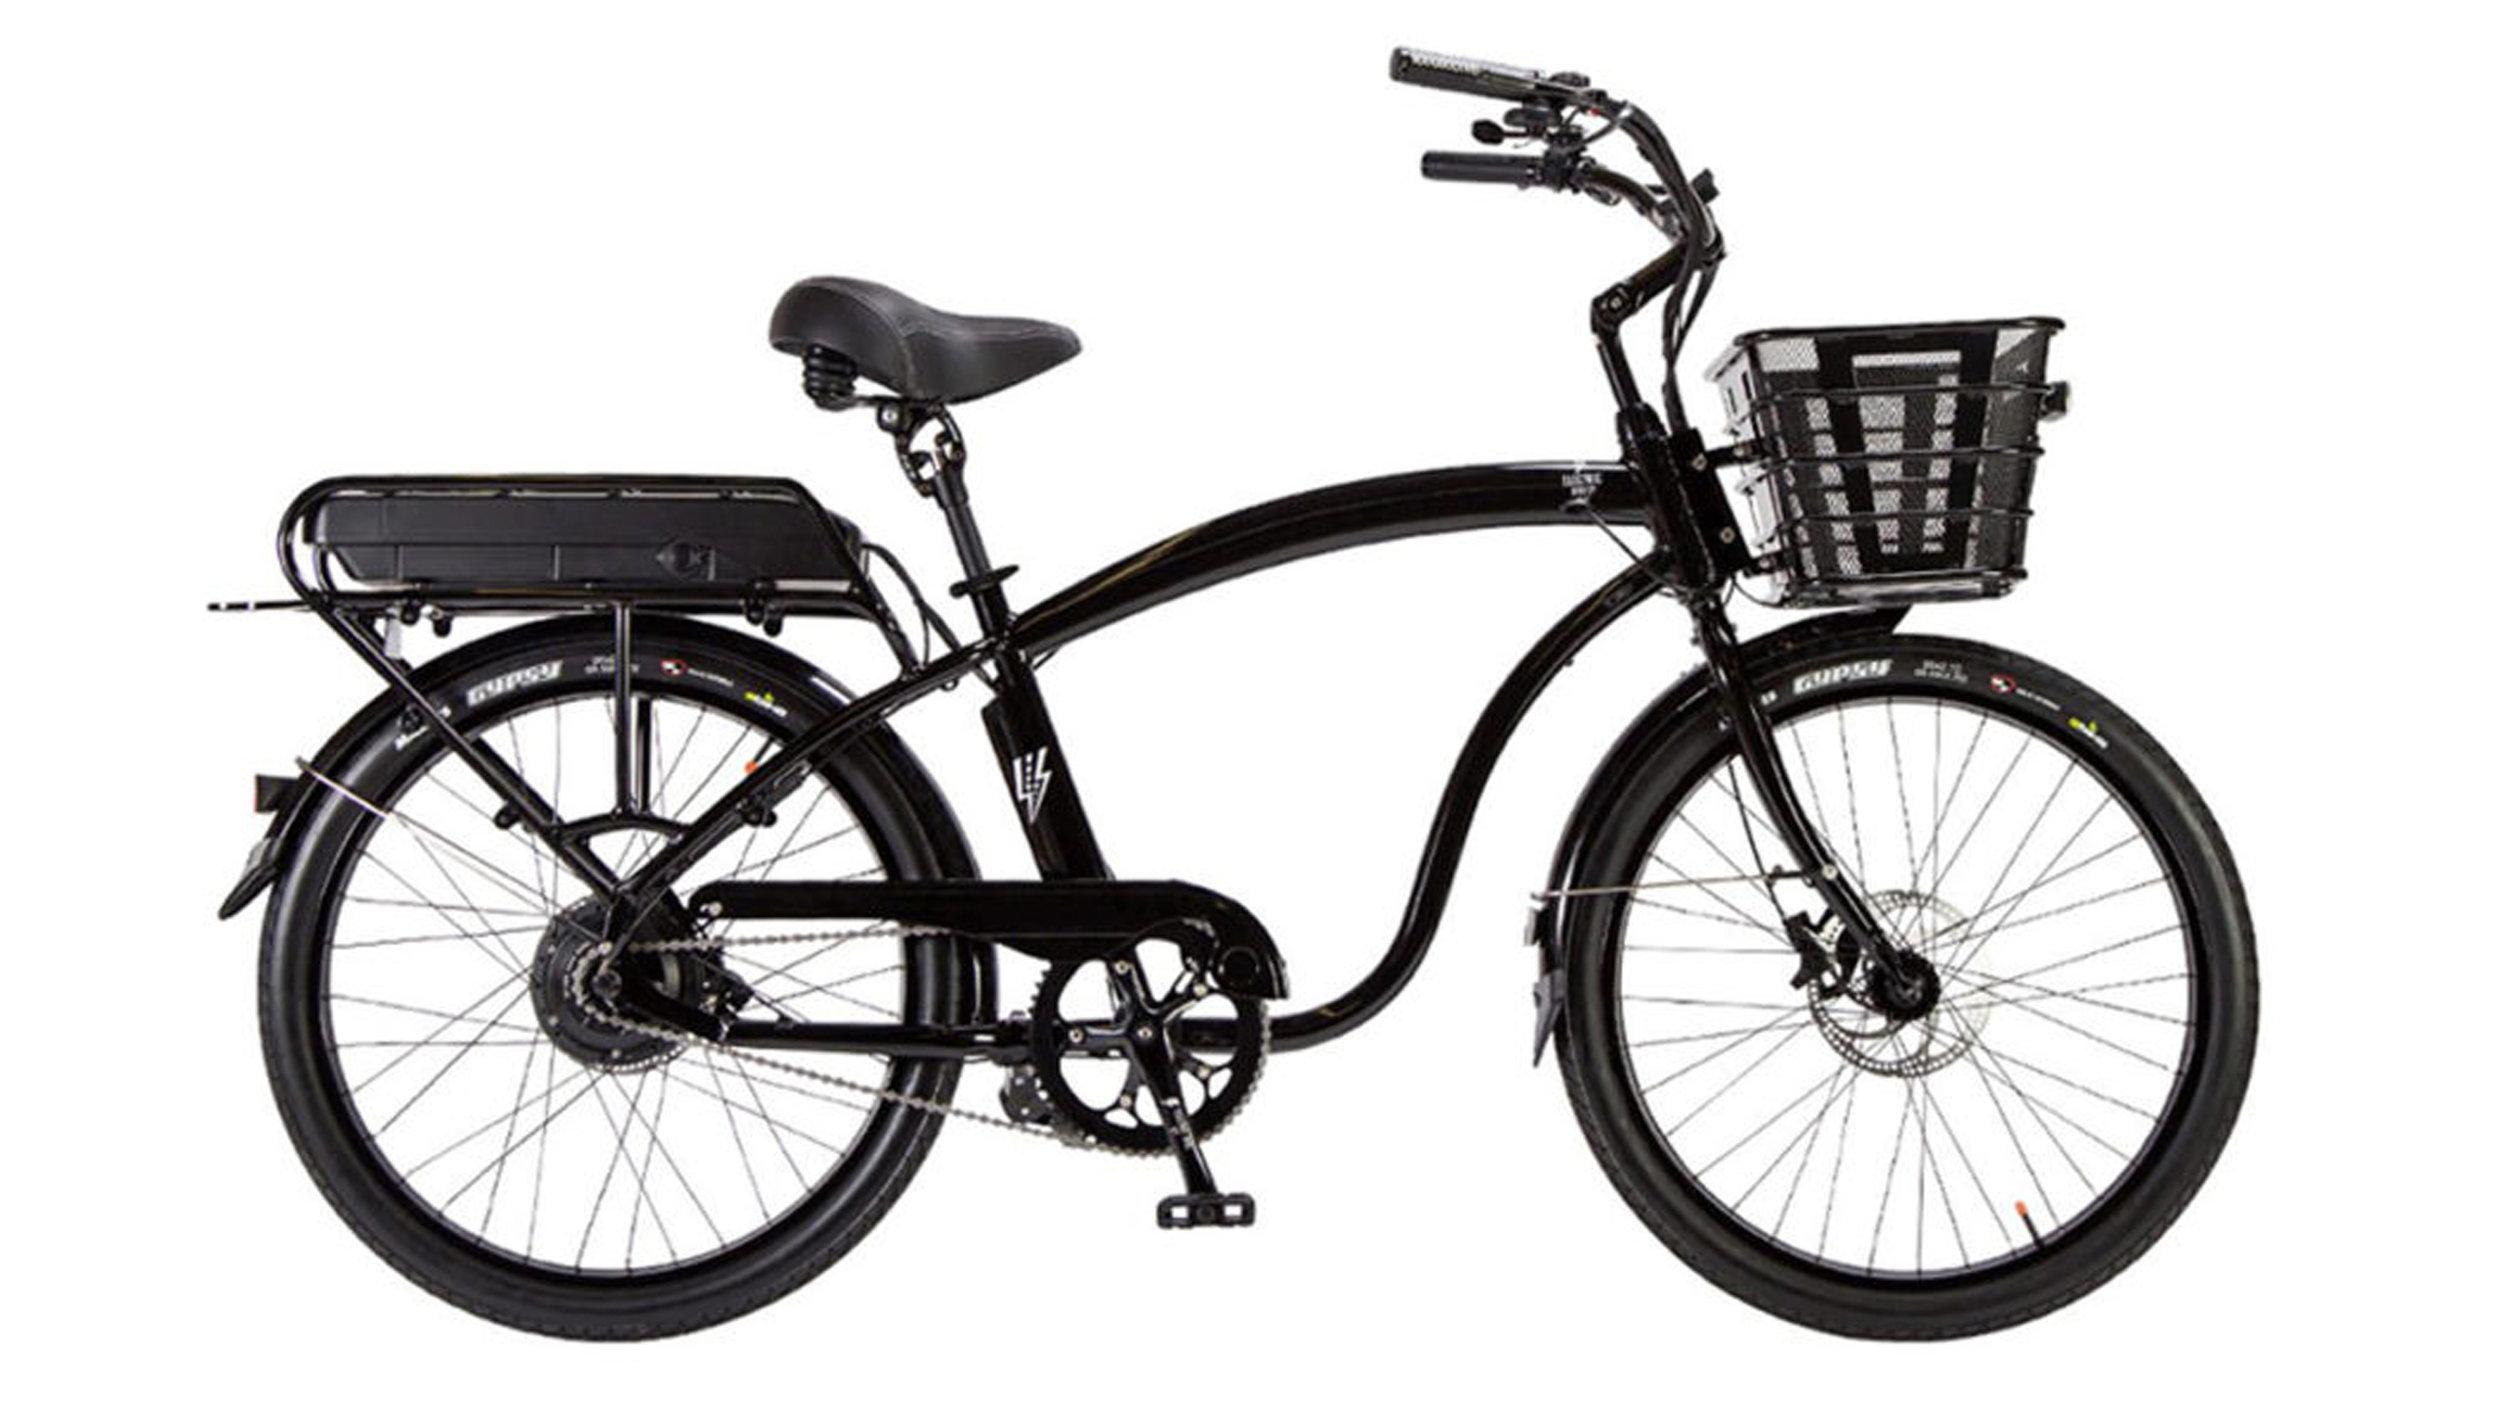 Photo credit : Electric Bike Company